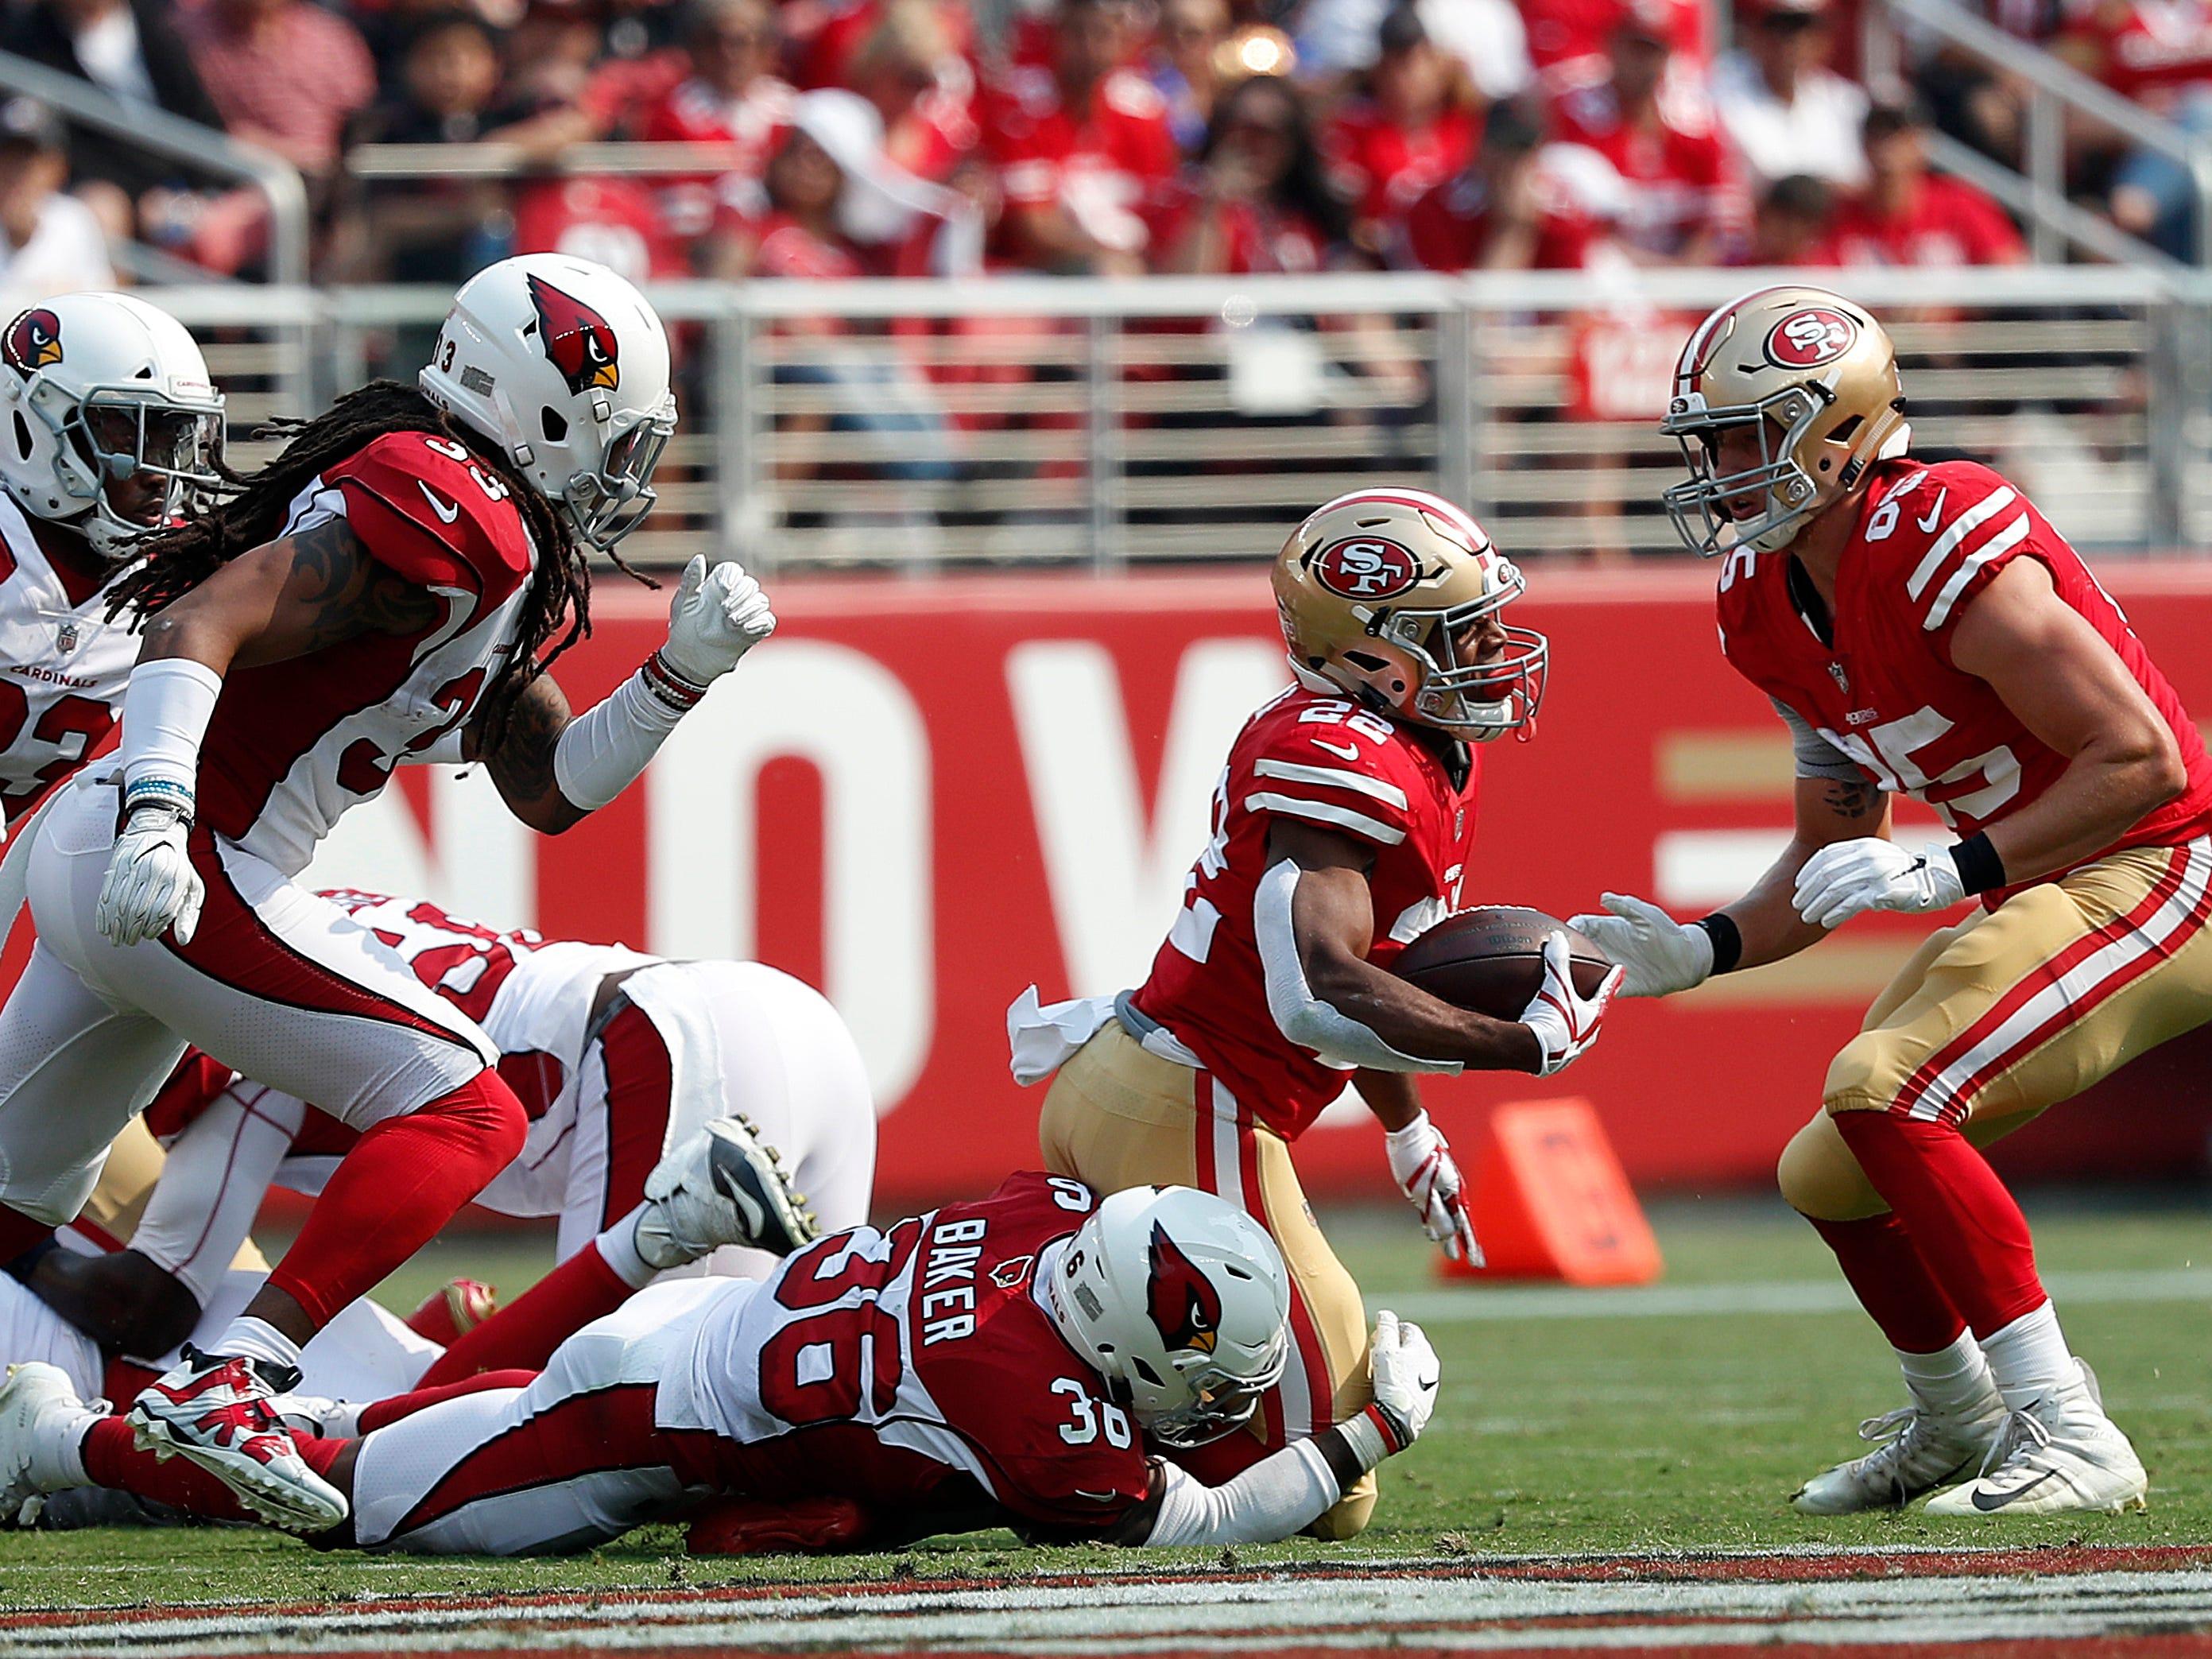 San Francisco 49ers running back Matt Breida (22) is tackled by Arizona Cardinals safety Budda Baker (36) during the first half of an NFL football game in Santa Clara, Calif., Sunday, Oct. 7, 2018.